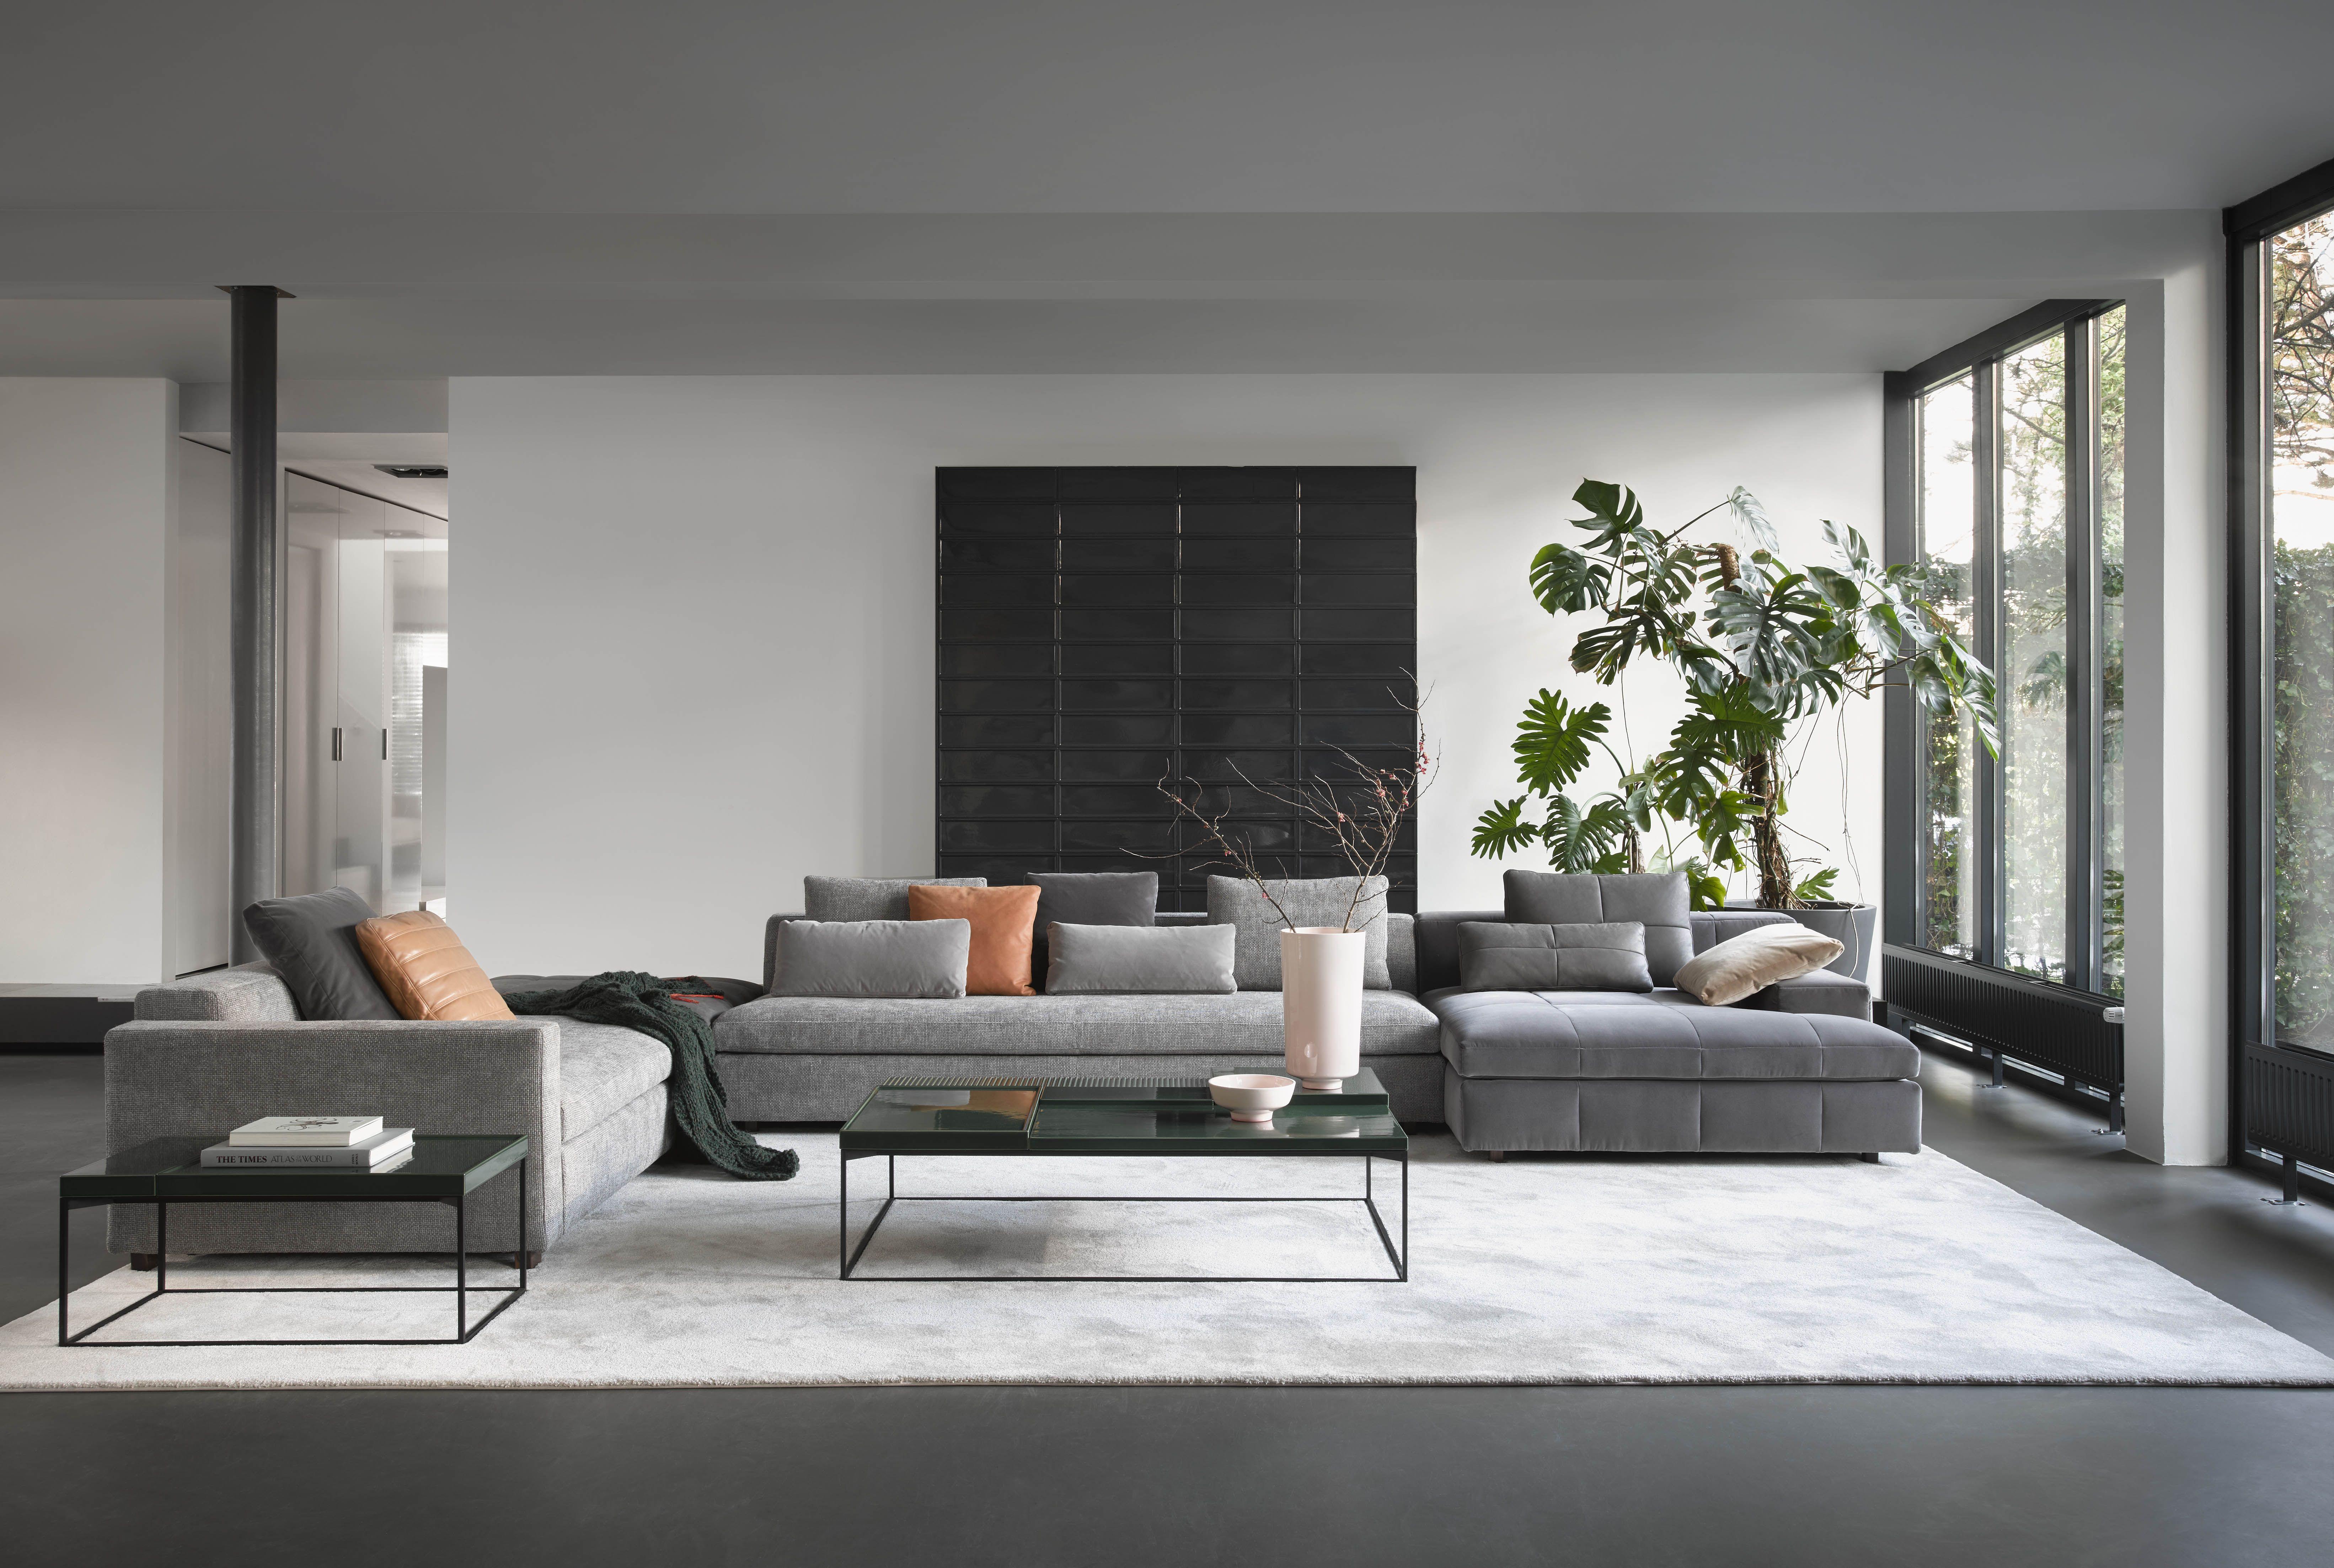 Madison Modular Sofa Design Contemporary Furniture Design Home Living Room